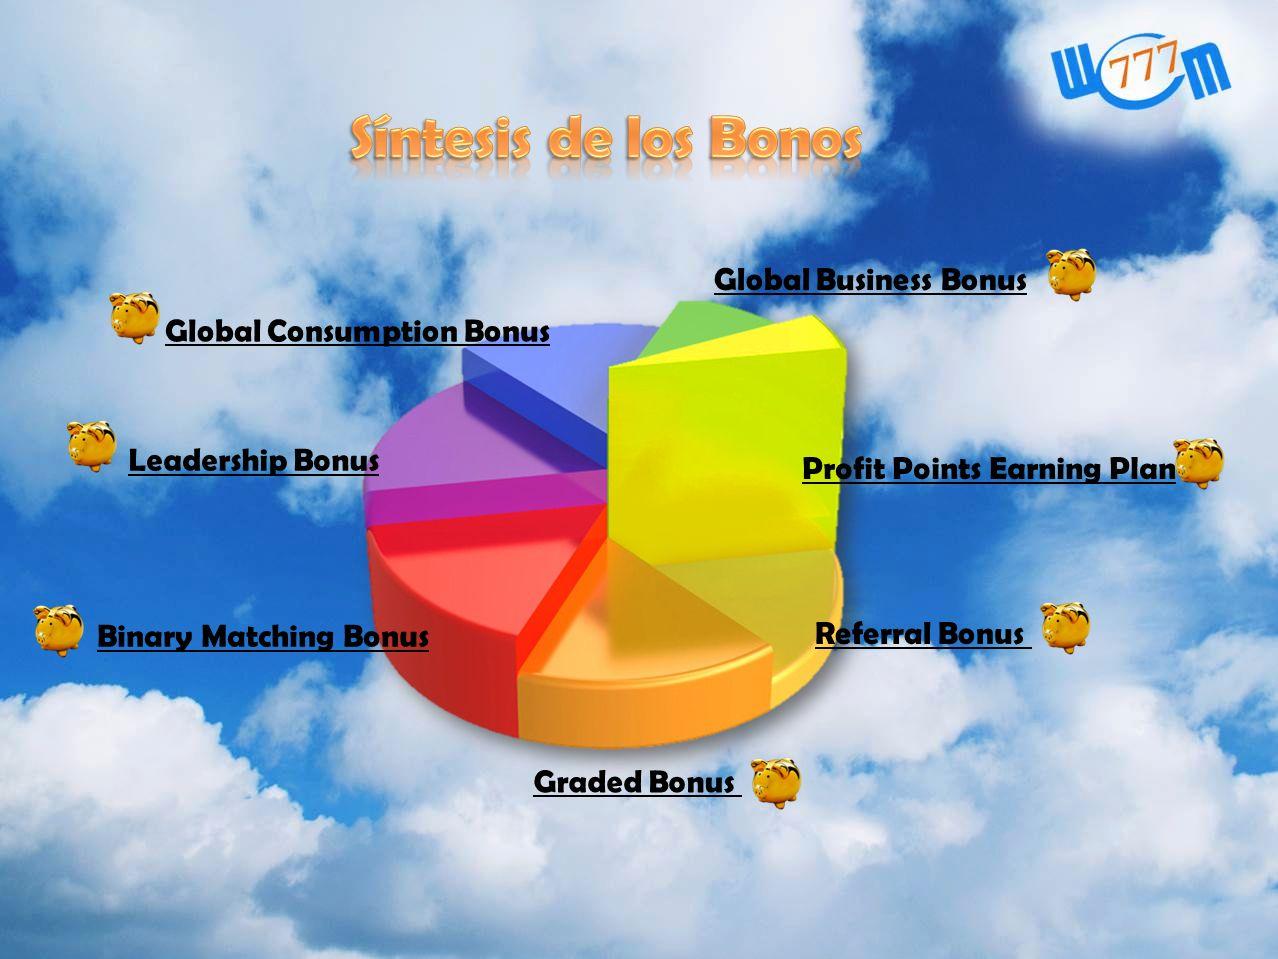 Global Business Bonus Profit Points Earning Plan Referral Bonus Graded Bonus Binary Matching Bonus Leadership Bonus Global Consumption Bonus